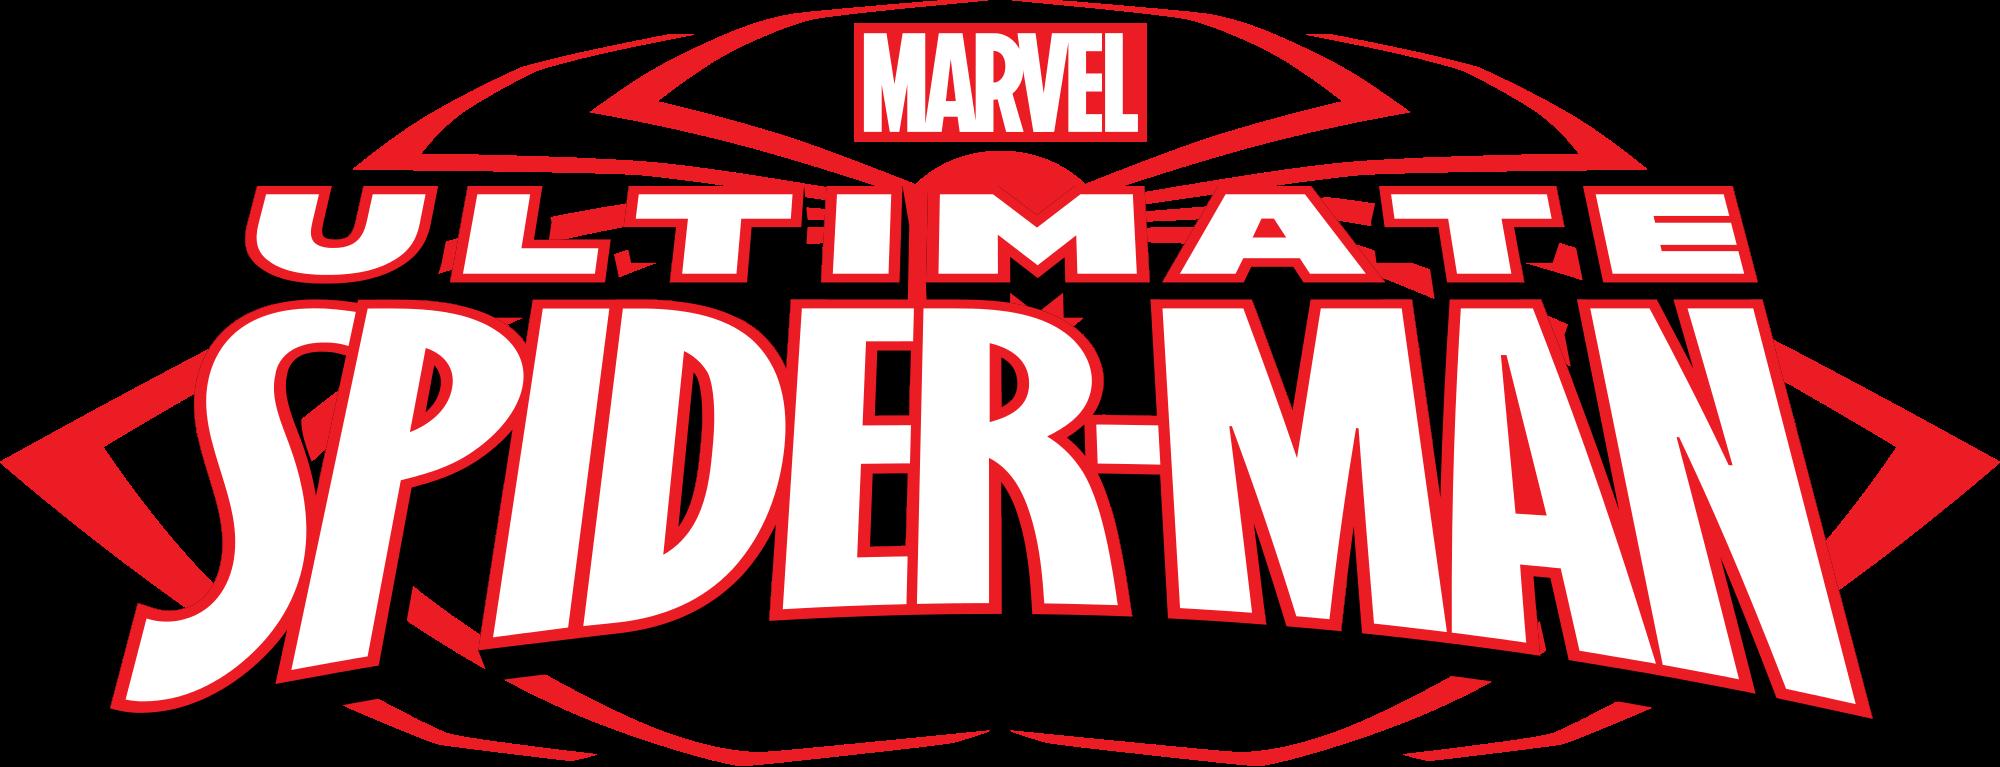 Ultimate Spider Man (Tv Series) Logo.svg.png - Spiderman, Transparent background PNG HD thumbnail